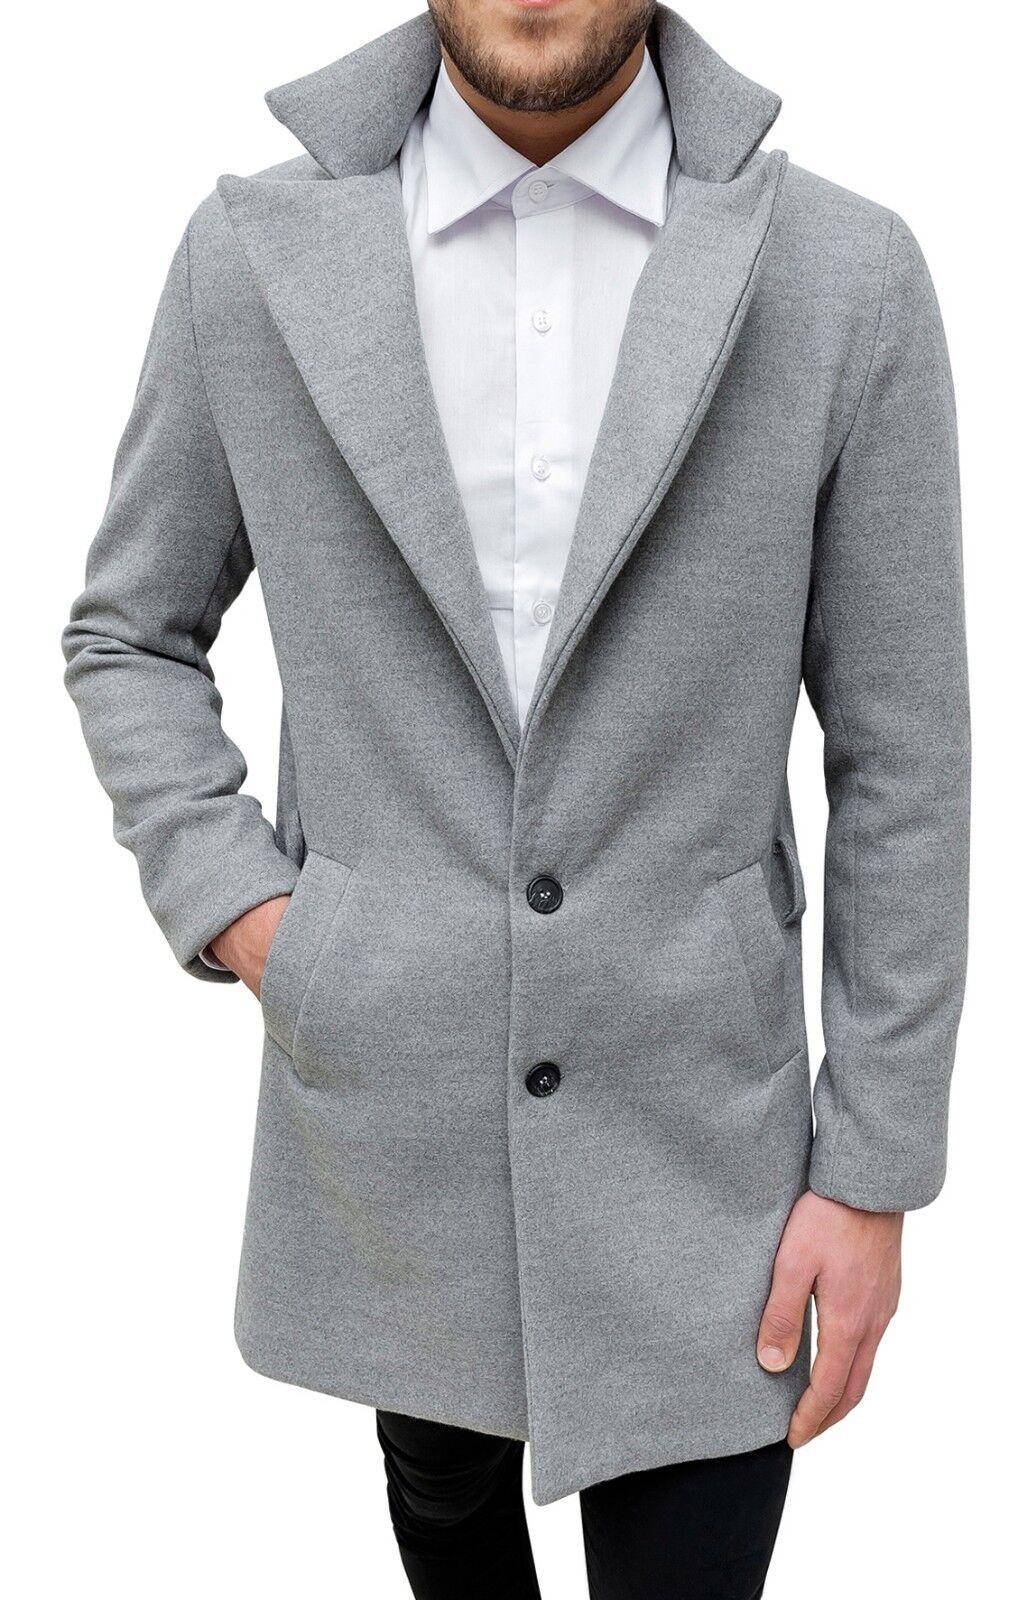 Elegante cappotto uomo grigio invernale lungo casual giacca soprabito  sartoriale.   7bdc6b40ca8